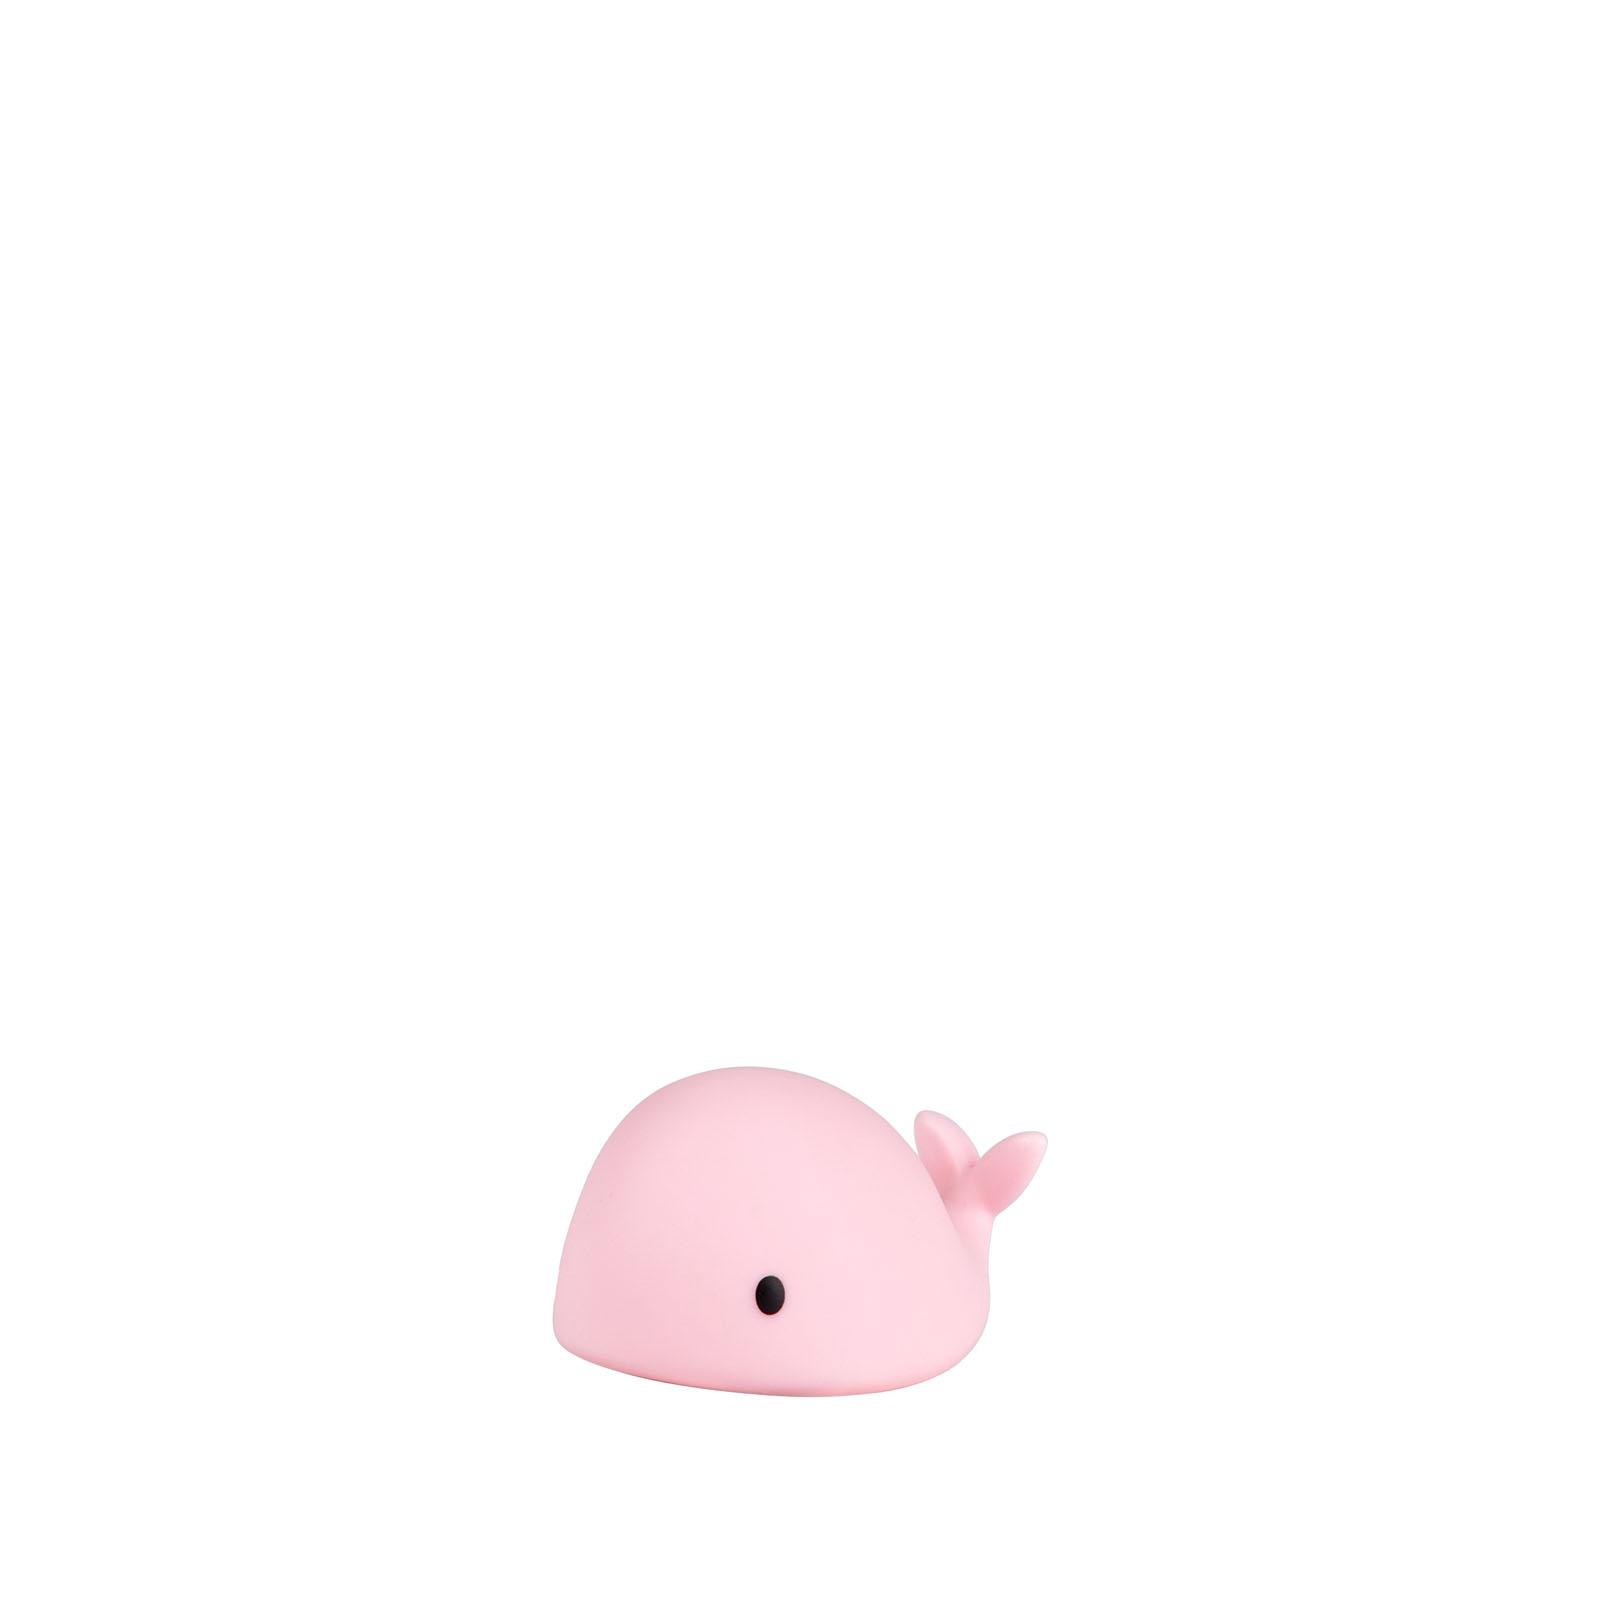 LED Lampe Nachtlicht Walfisch Moby Mini rosa